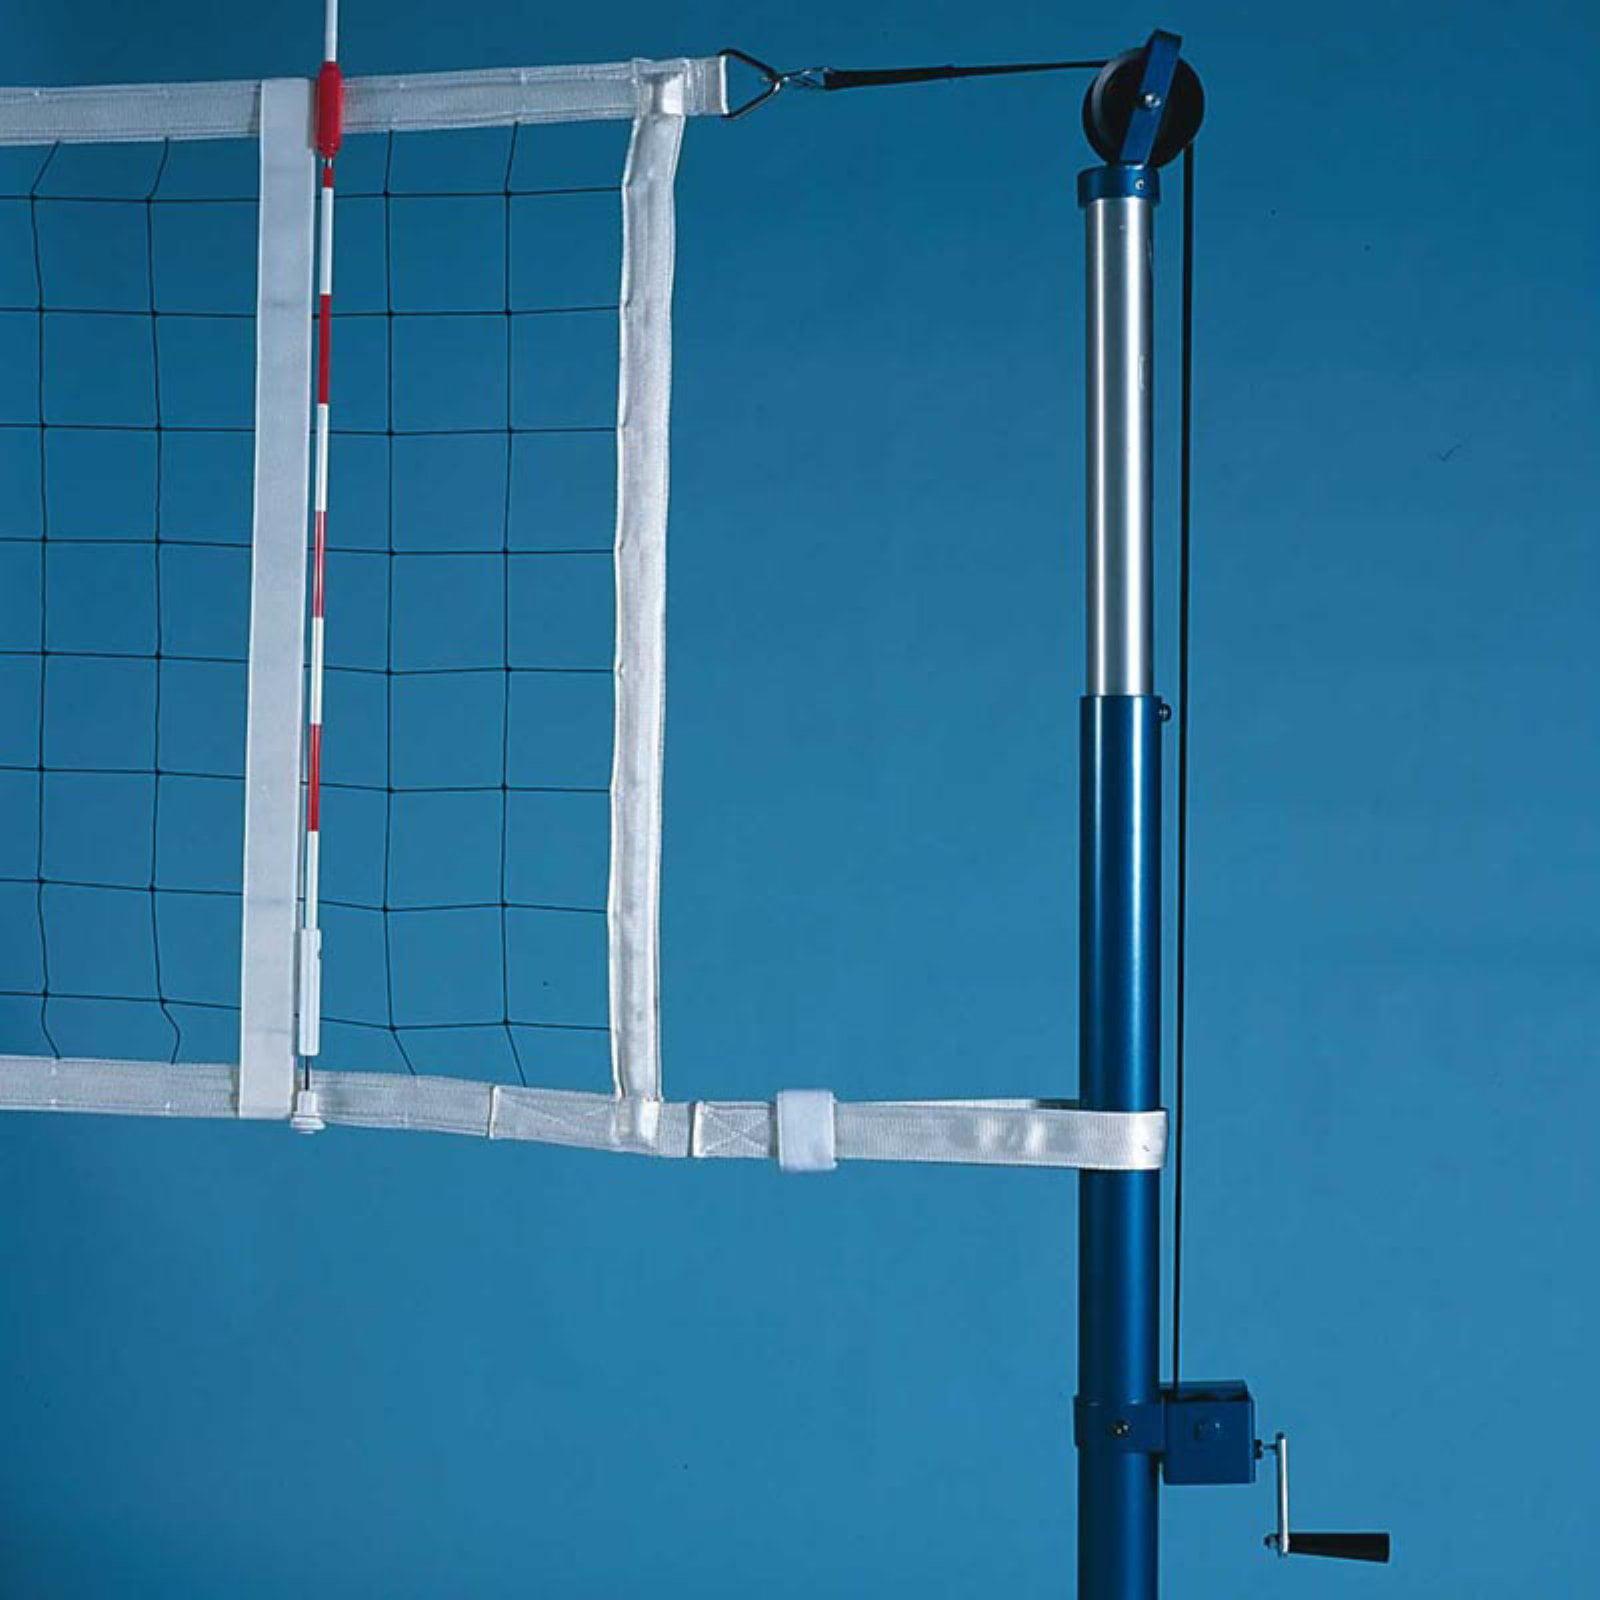 Jaypro Flex Net International Volleyball Net